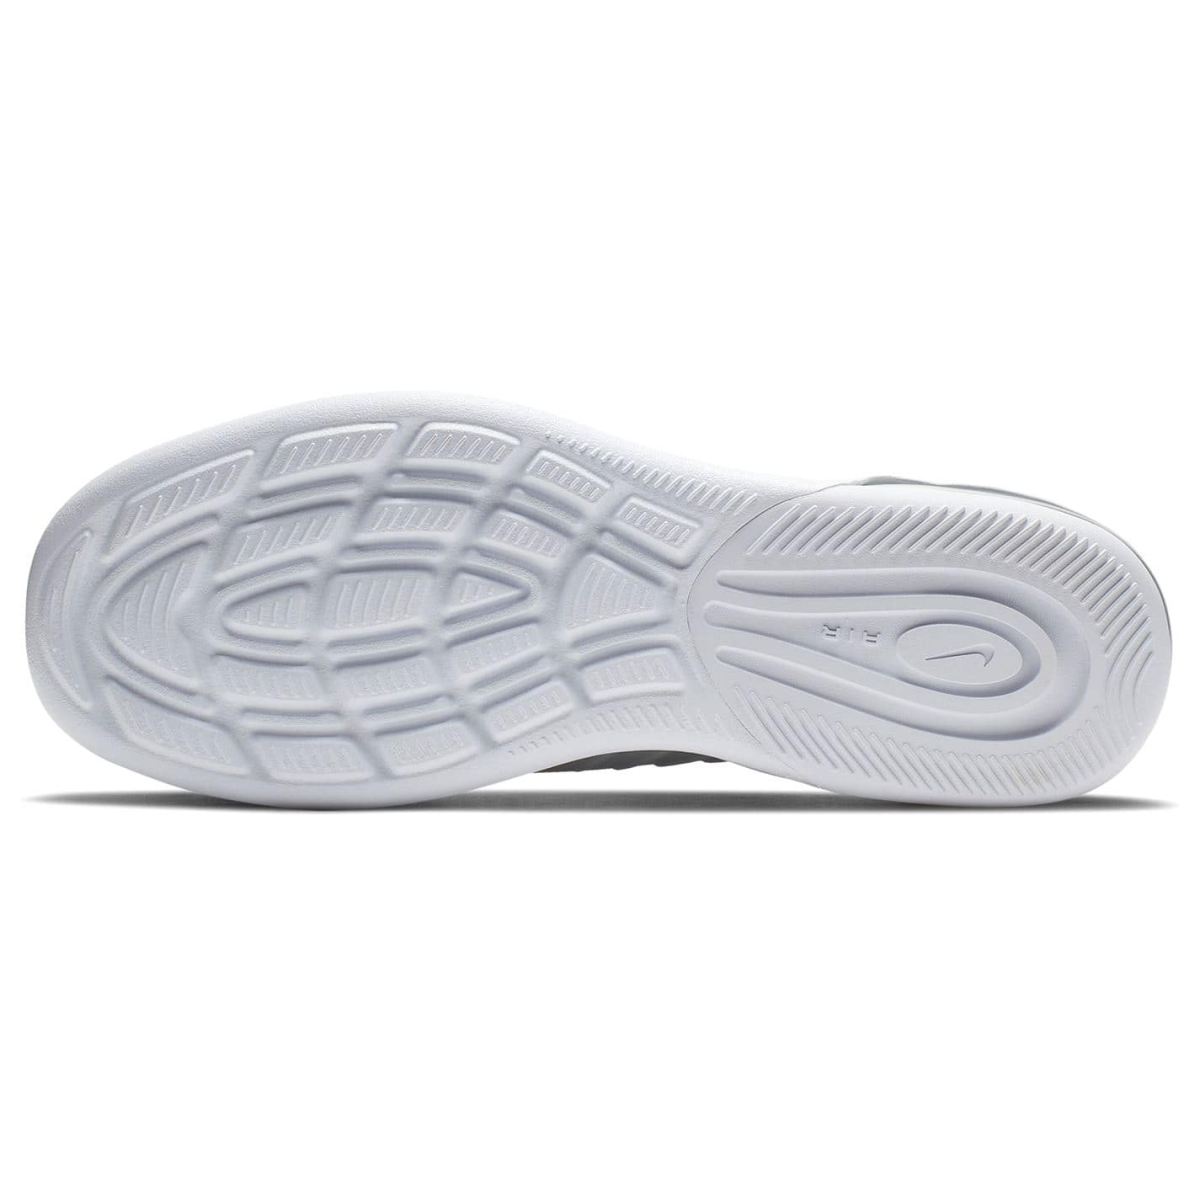 NIKE-Air-Max-Axis-Scarpe-da-ginnastica-Scarpe-da-Corsa-Uomo-Sneaker-Scarpe-Sportive-Fitness-1313 miniatura 23